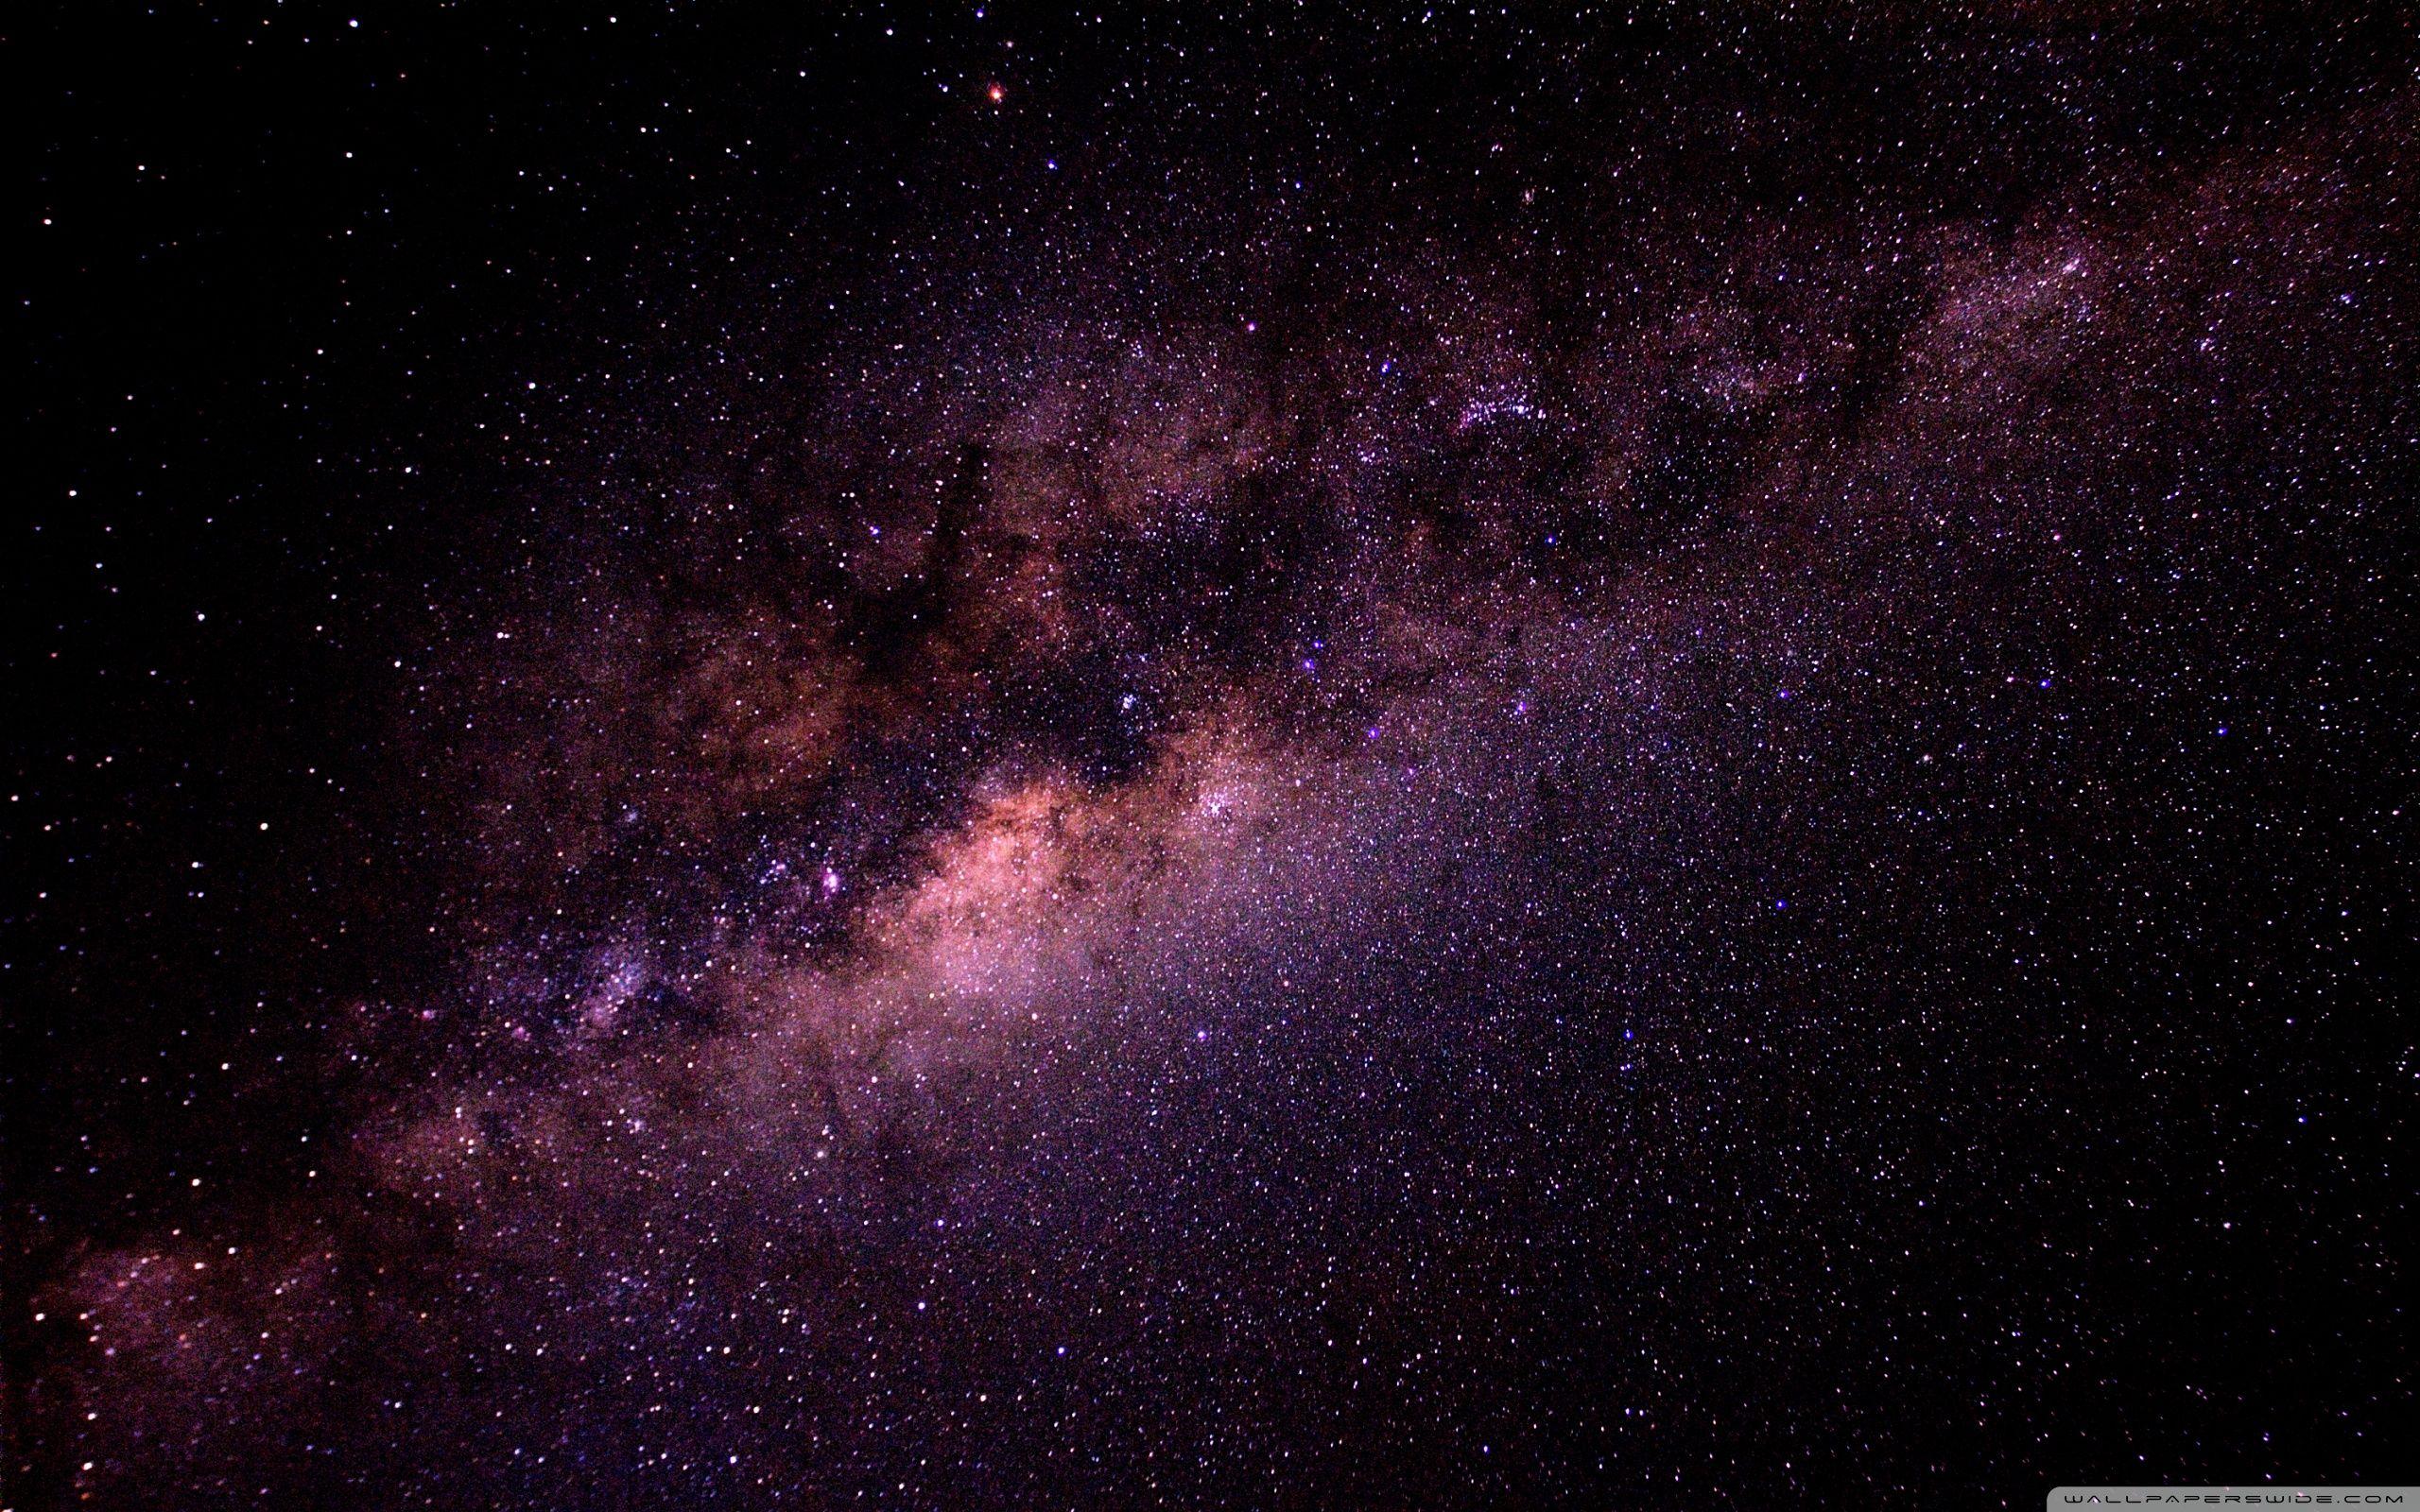 milky way galaxy live wallpaper - photo #27